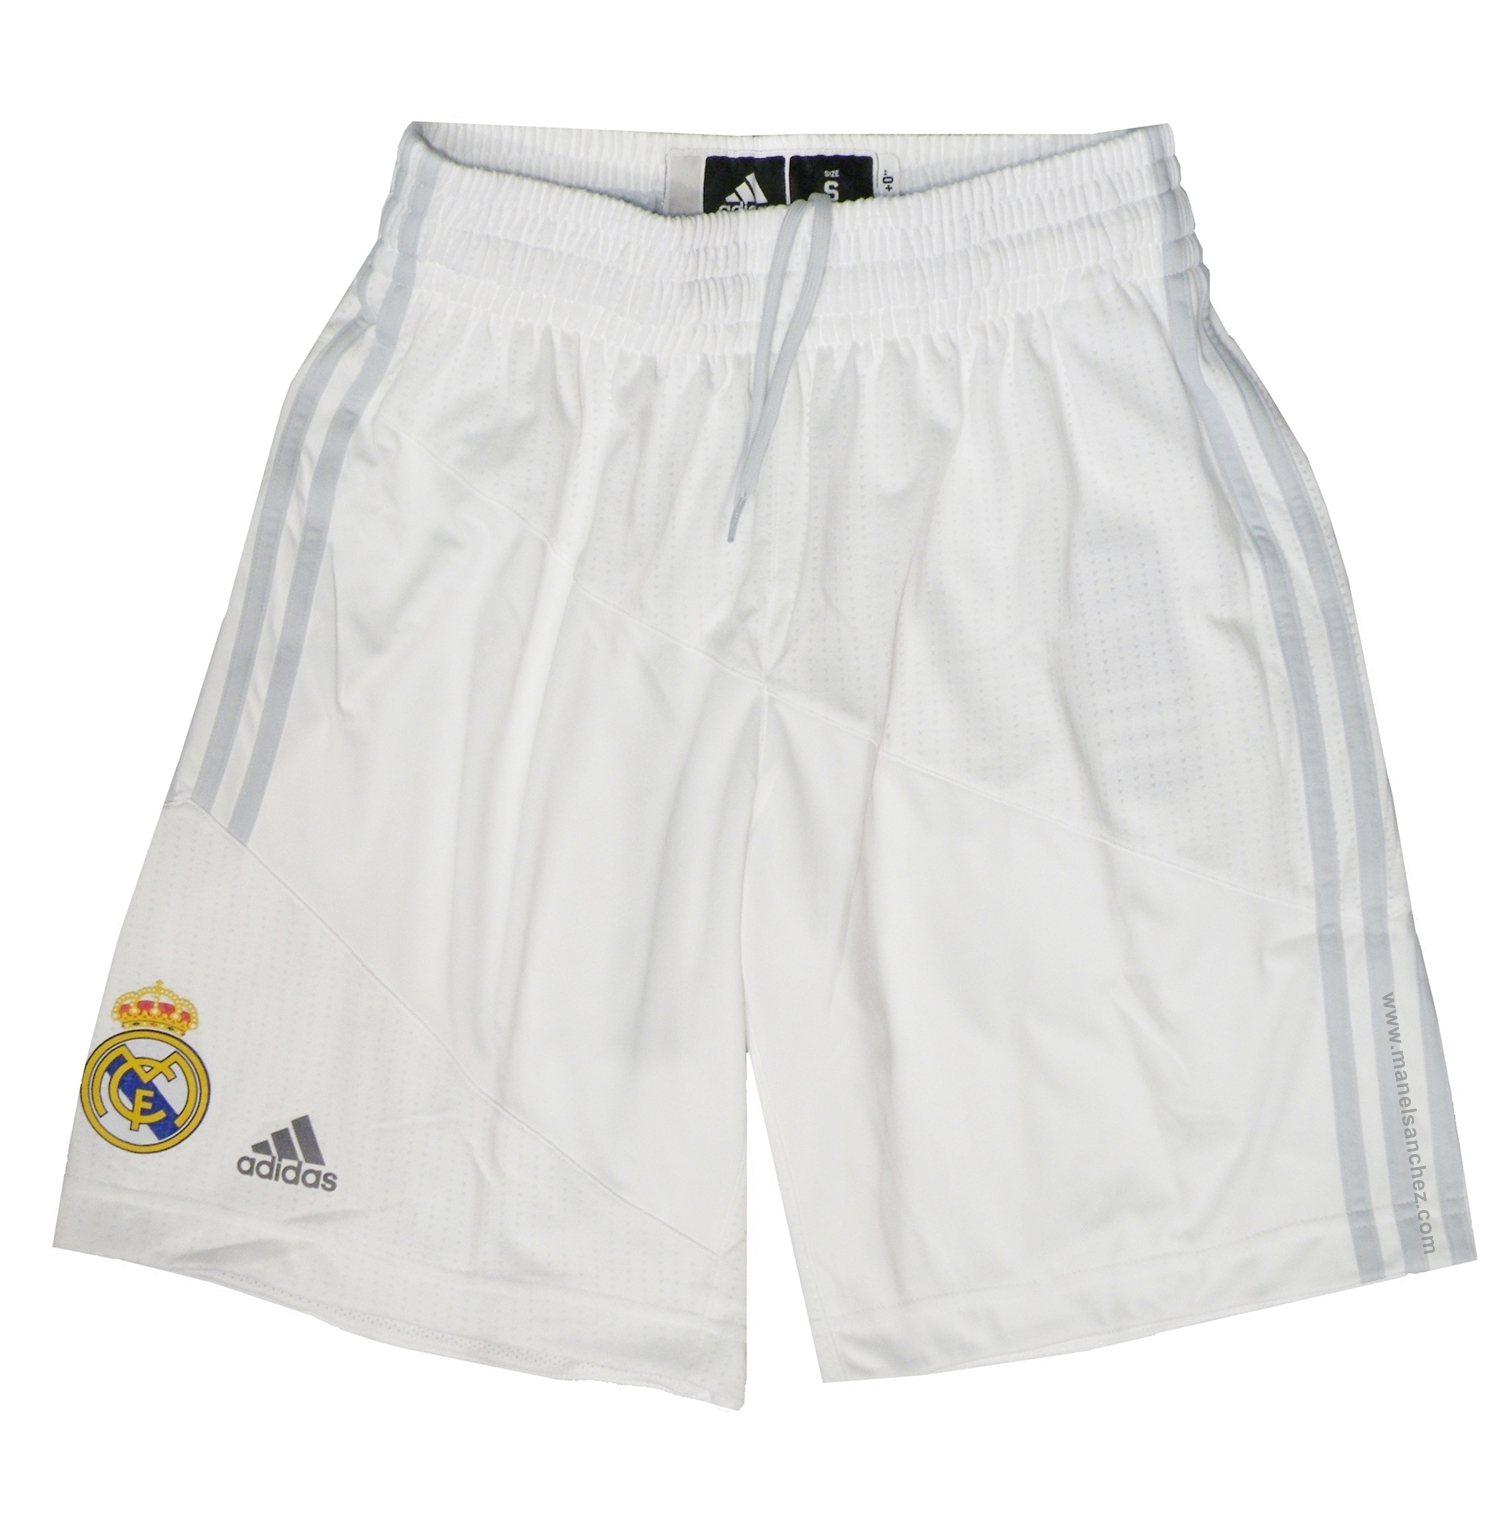 05ceb36c Adidas Short Real Madrid Baloncesto 2015-2016 (blanco/gris onix)